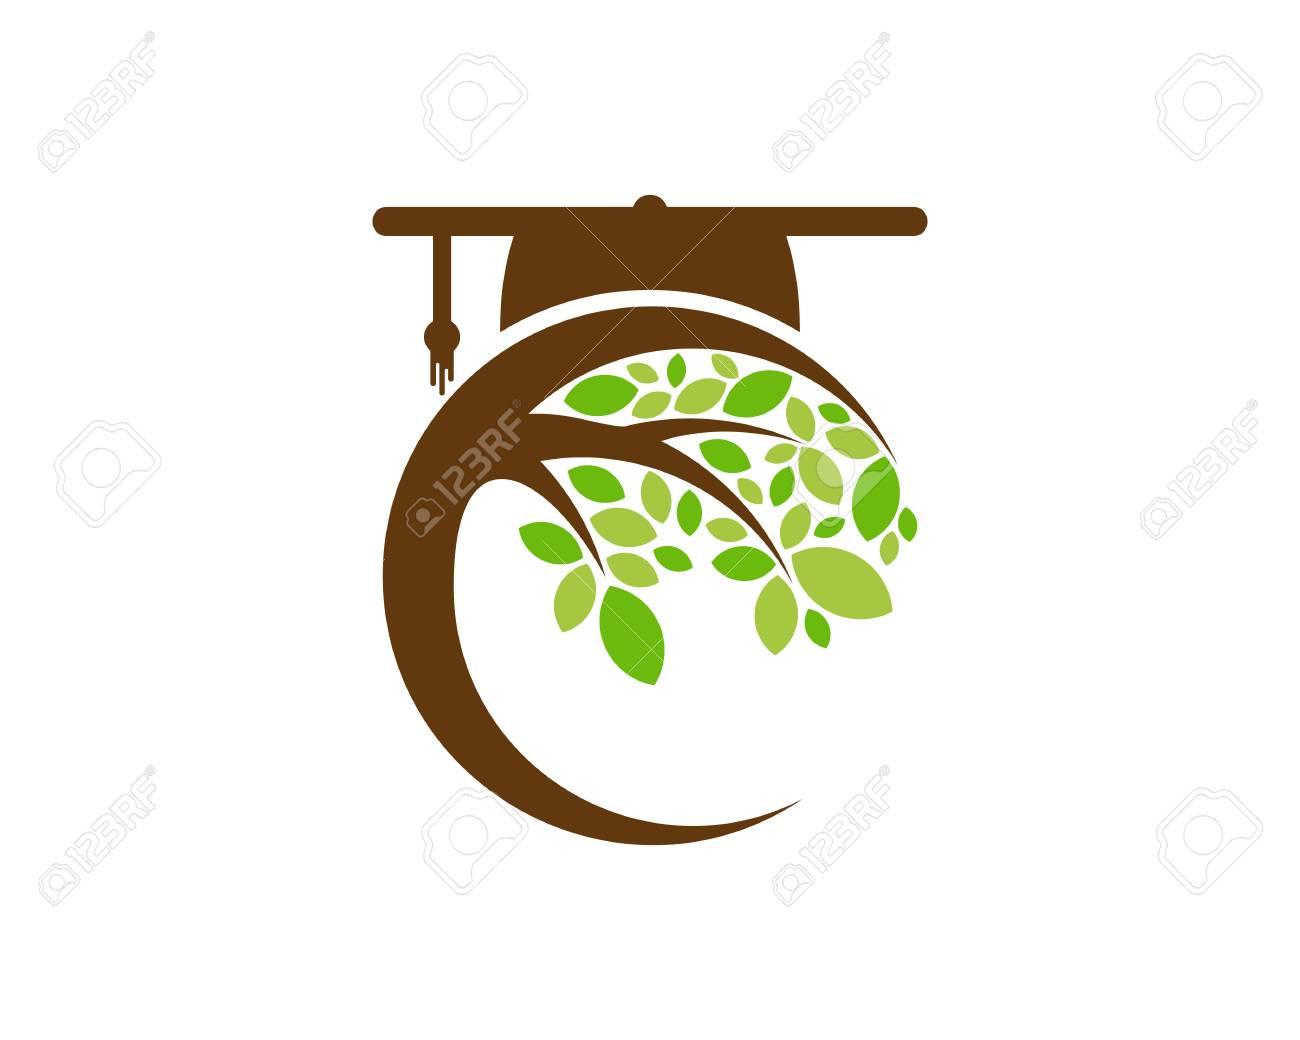 School Tree Logo Icon Design - 102230763